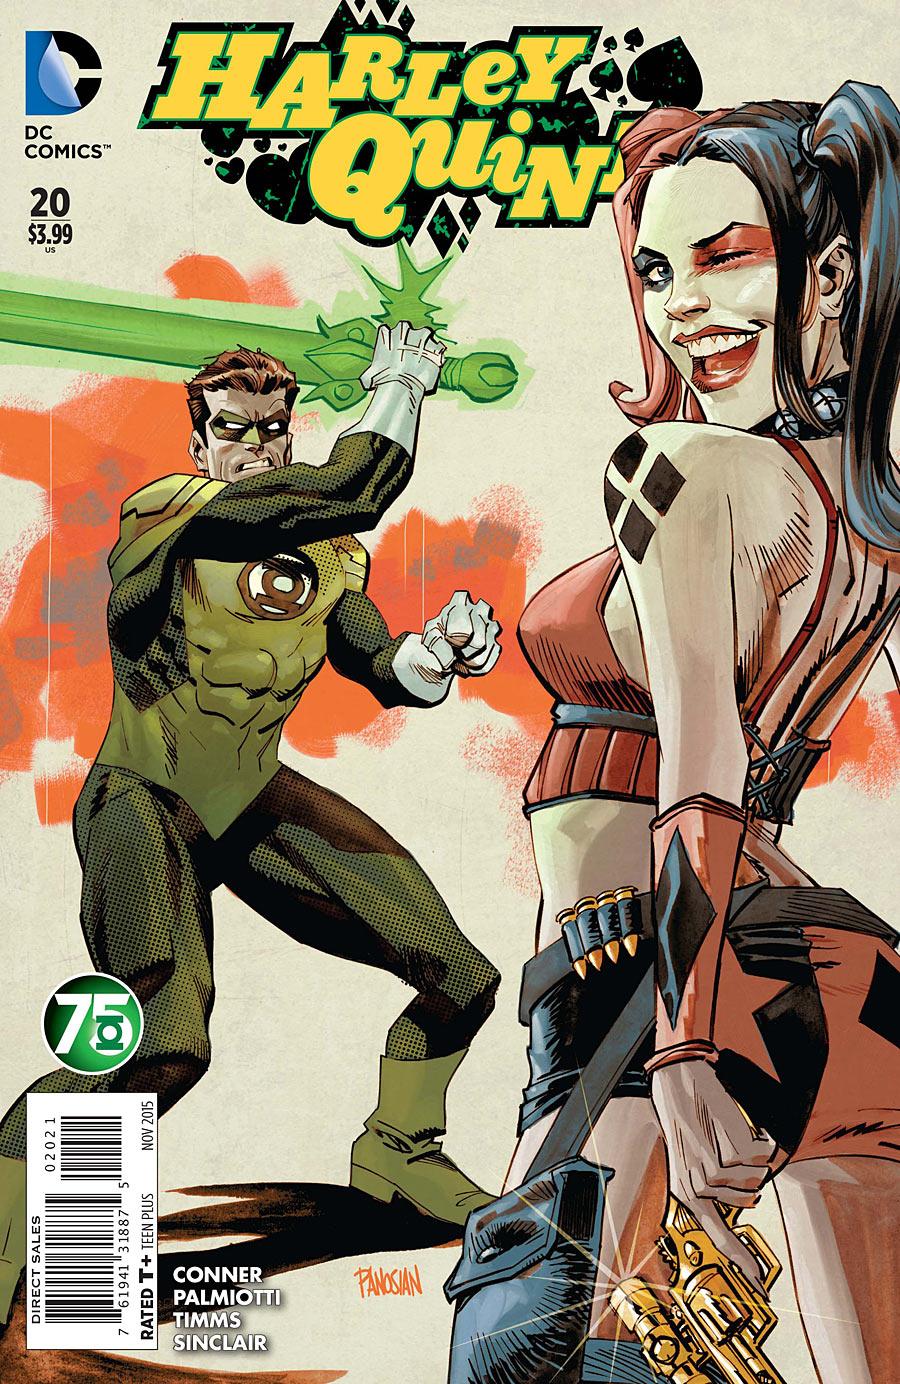 Harley Quinn Vol 2 20 Green Lantern 75th Anniversary Variant.jpg